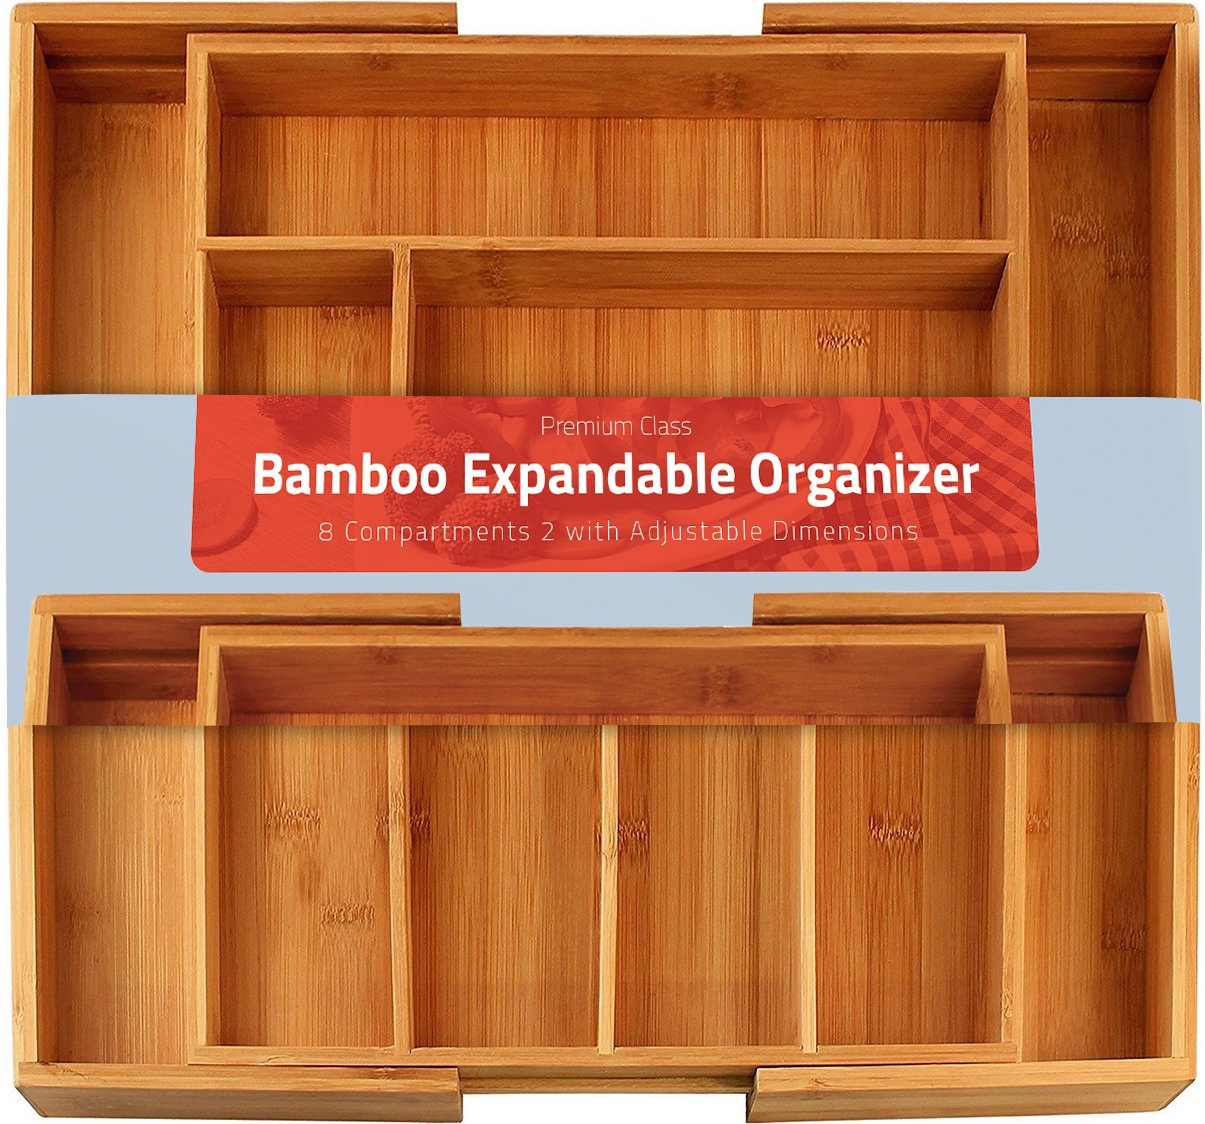 Utopia Kitchen Bamboo Expandable Cutlery Tray - Silverware & Utensils Organizer - 8 Compartment